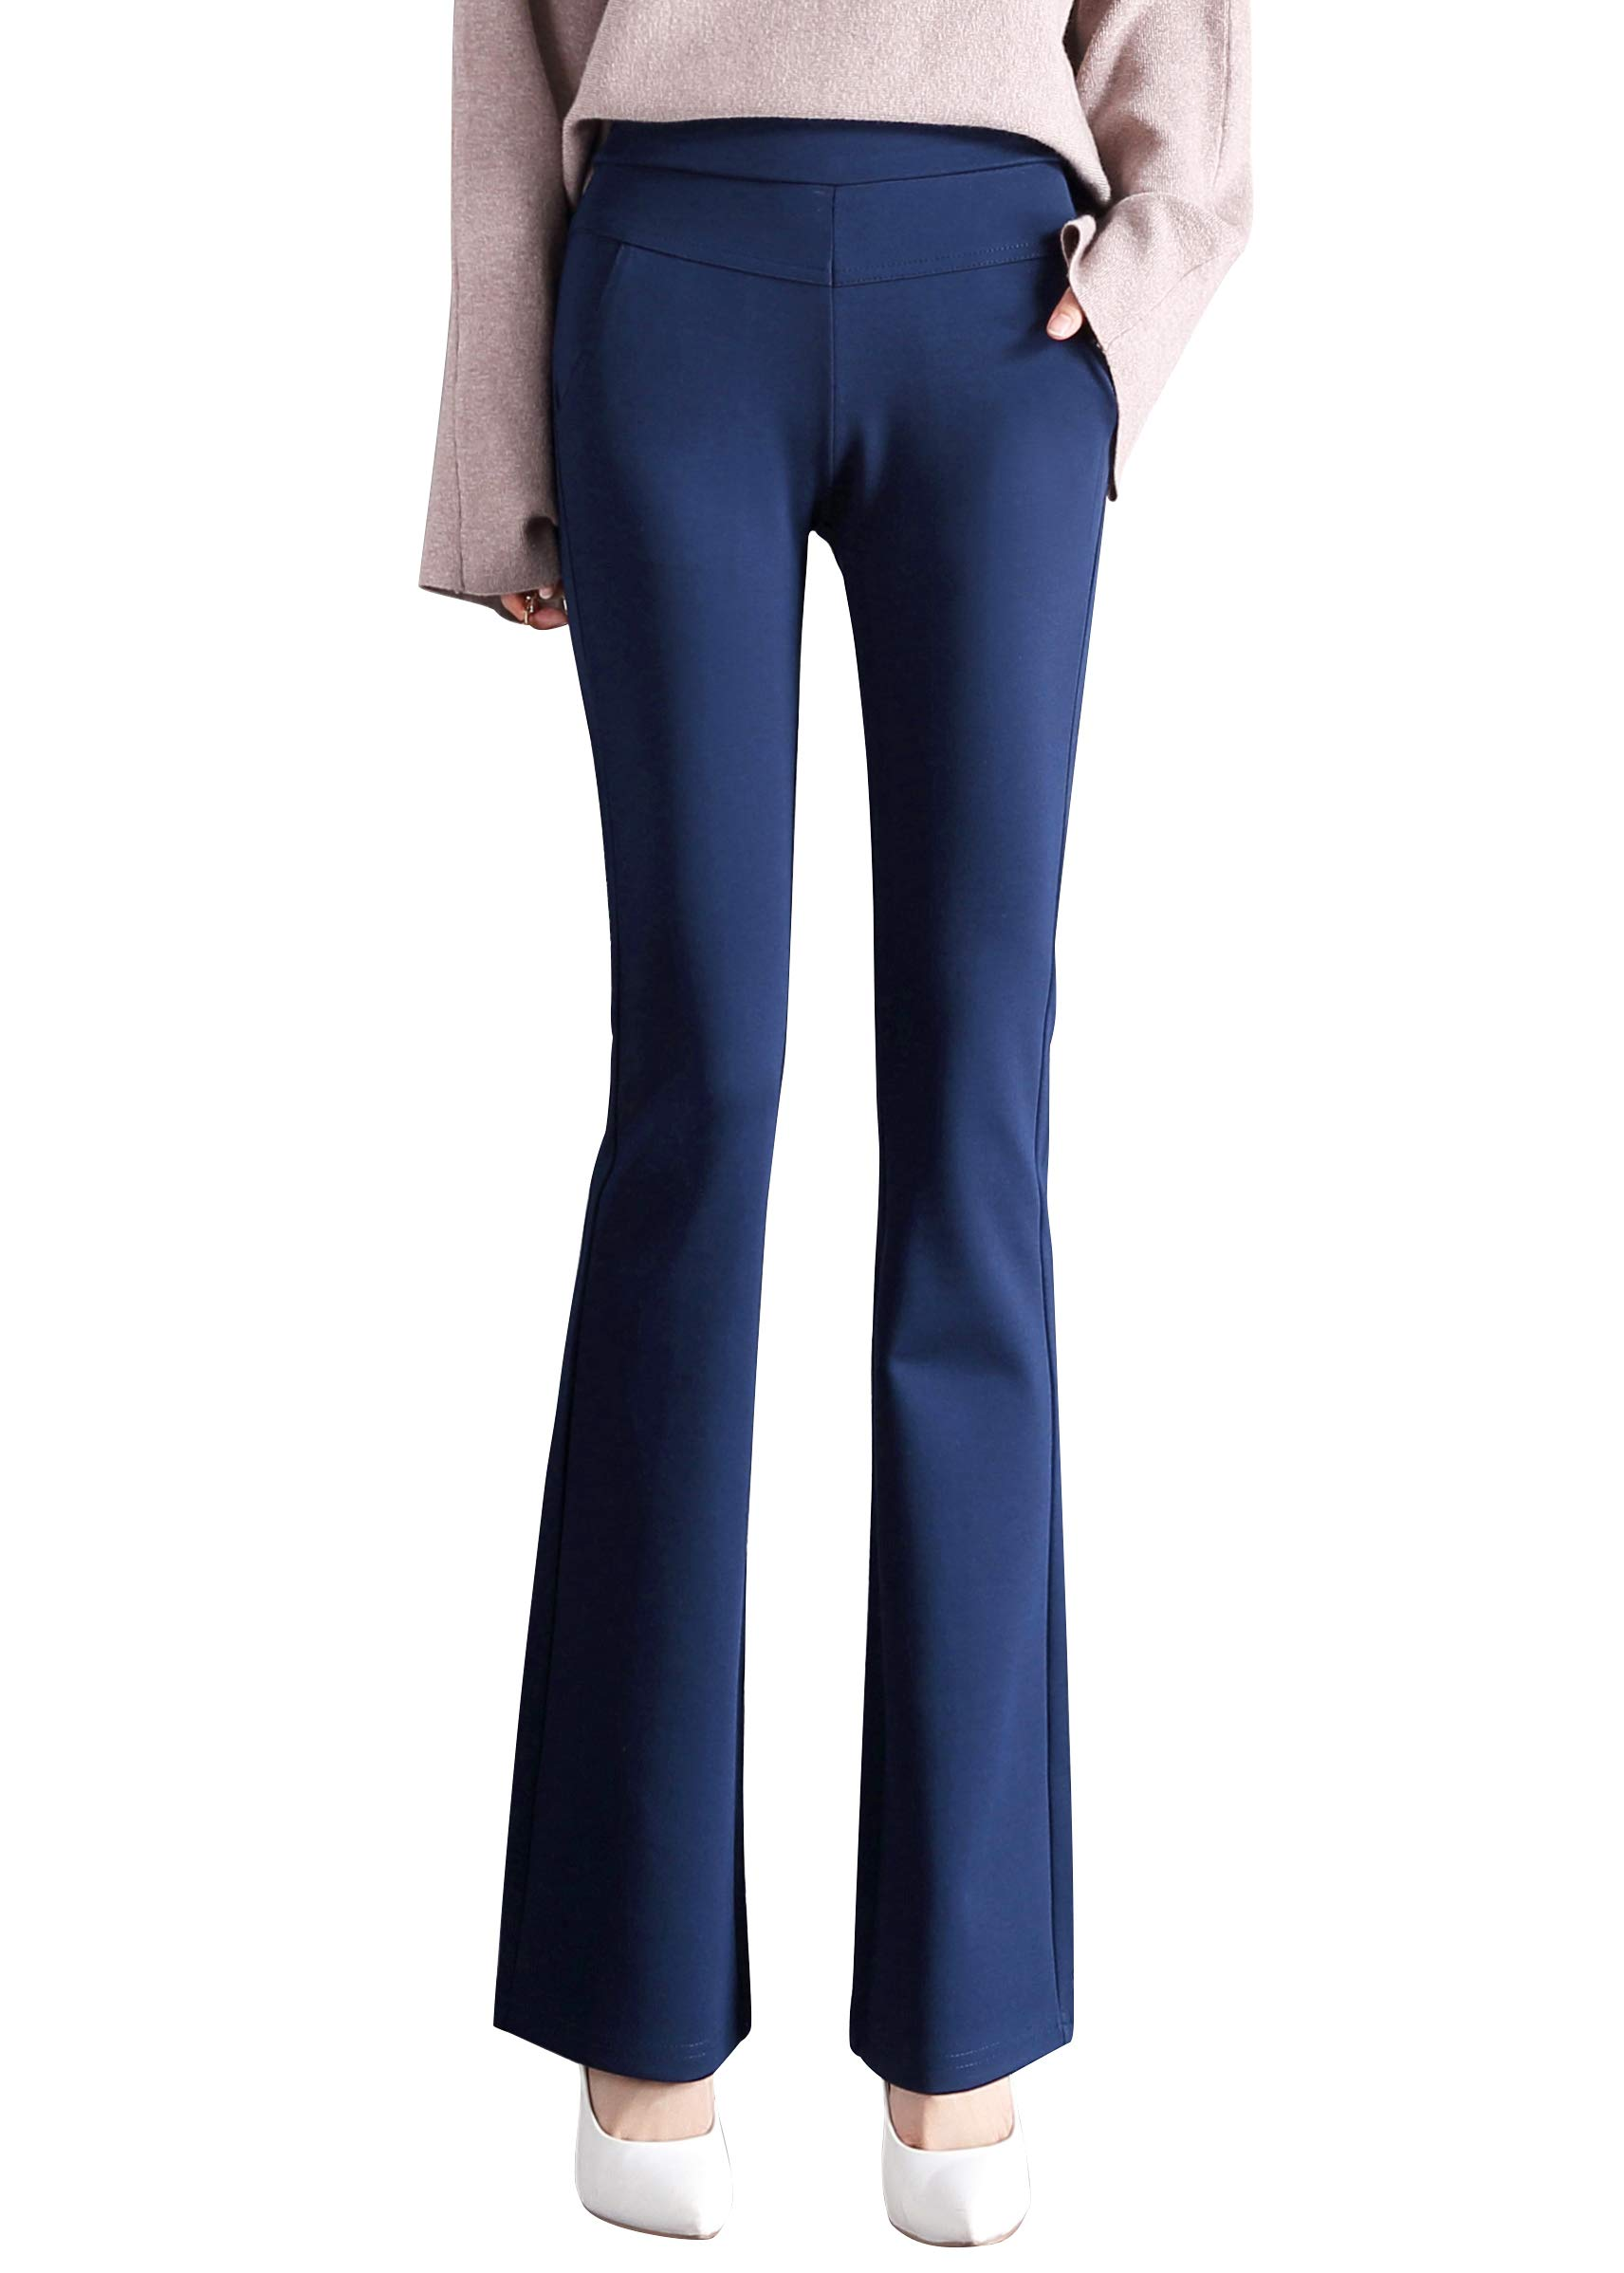 Smibra Womens Simple Dress Pants Stretchy All Around Comfort Boot Cut Pull On Slacks